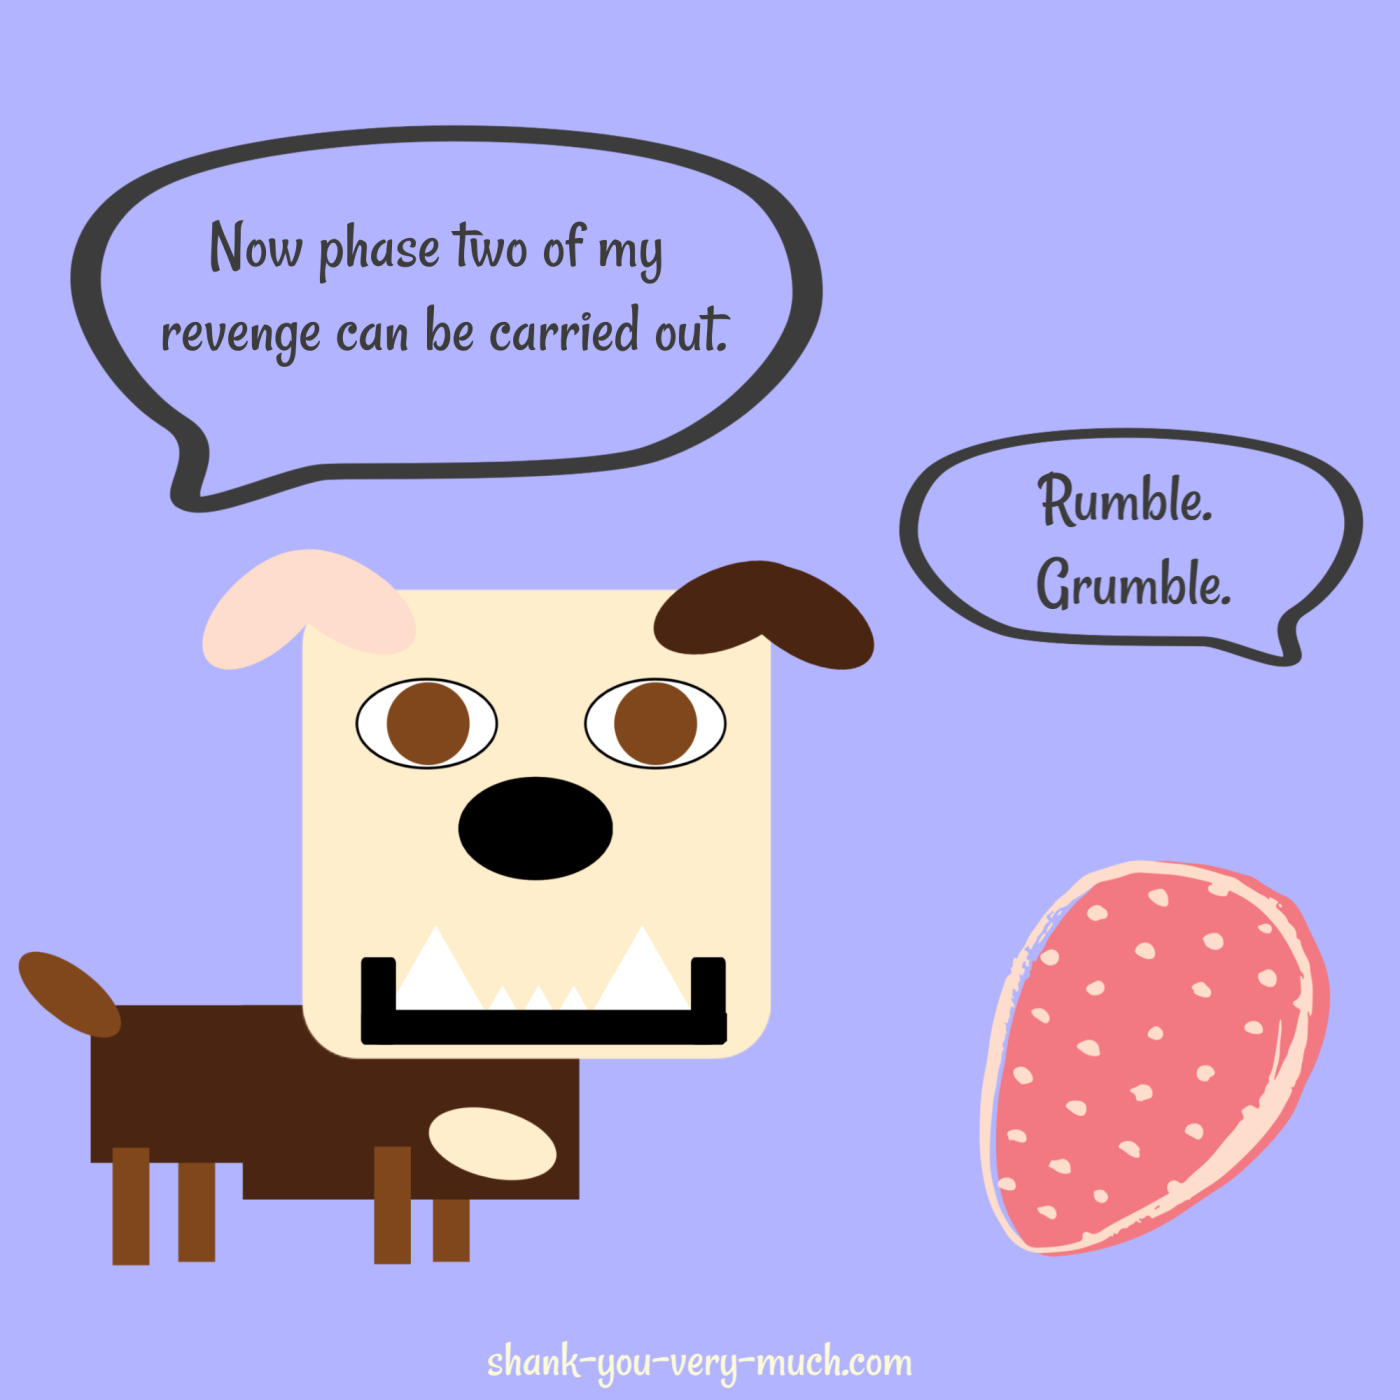 A cartoon showing Lola the English bulldog talking to a dinosaur egg. Lola says